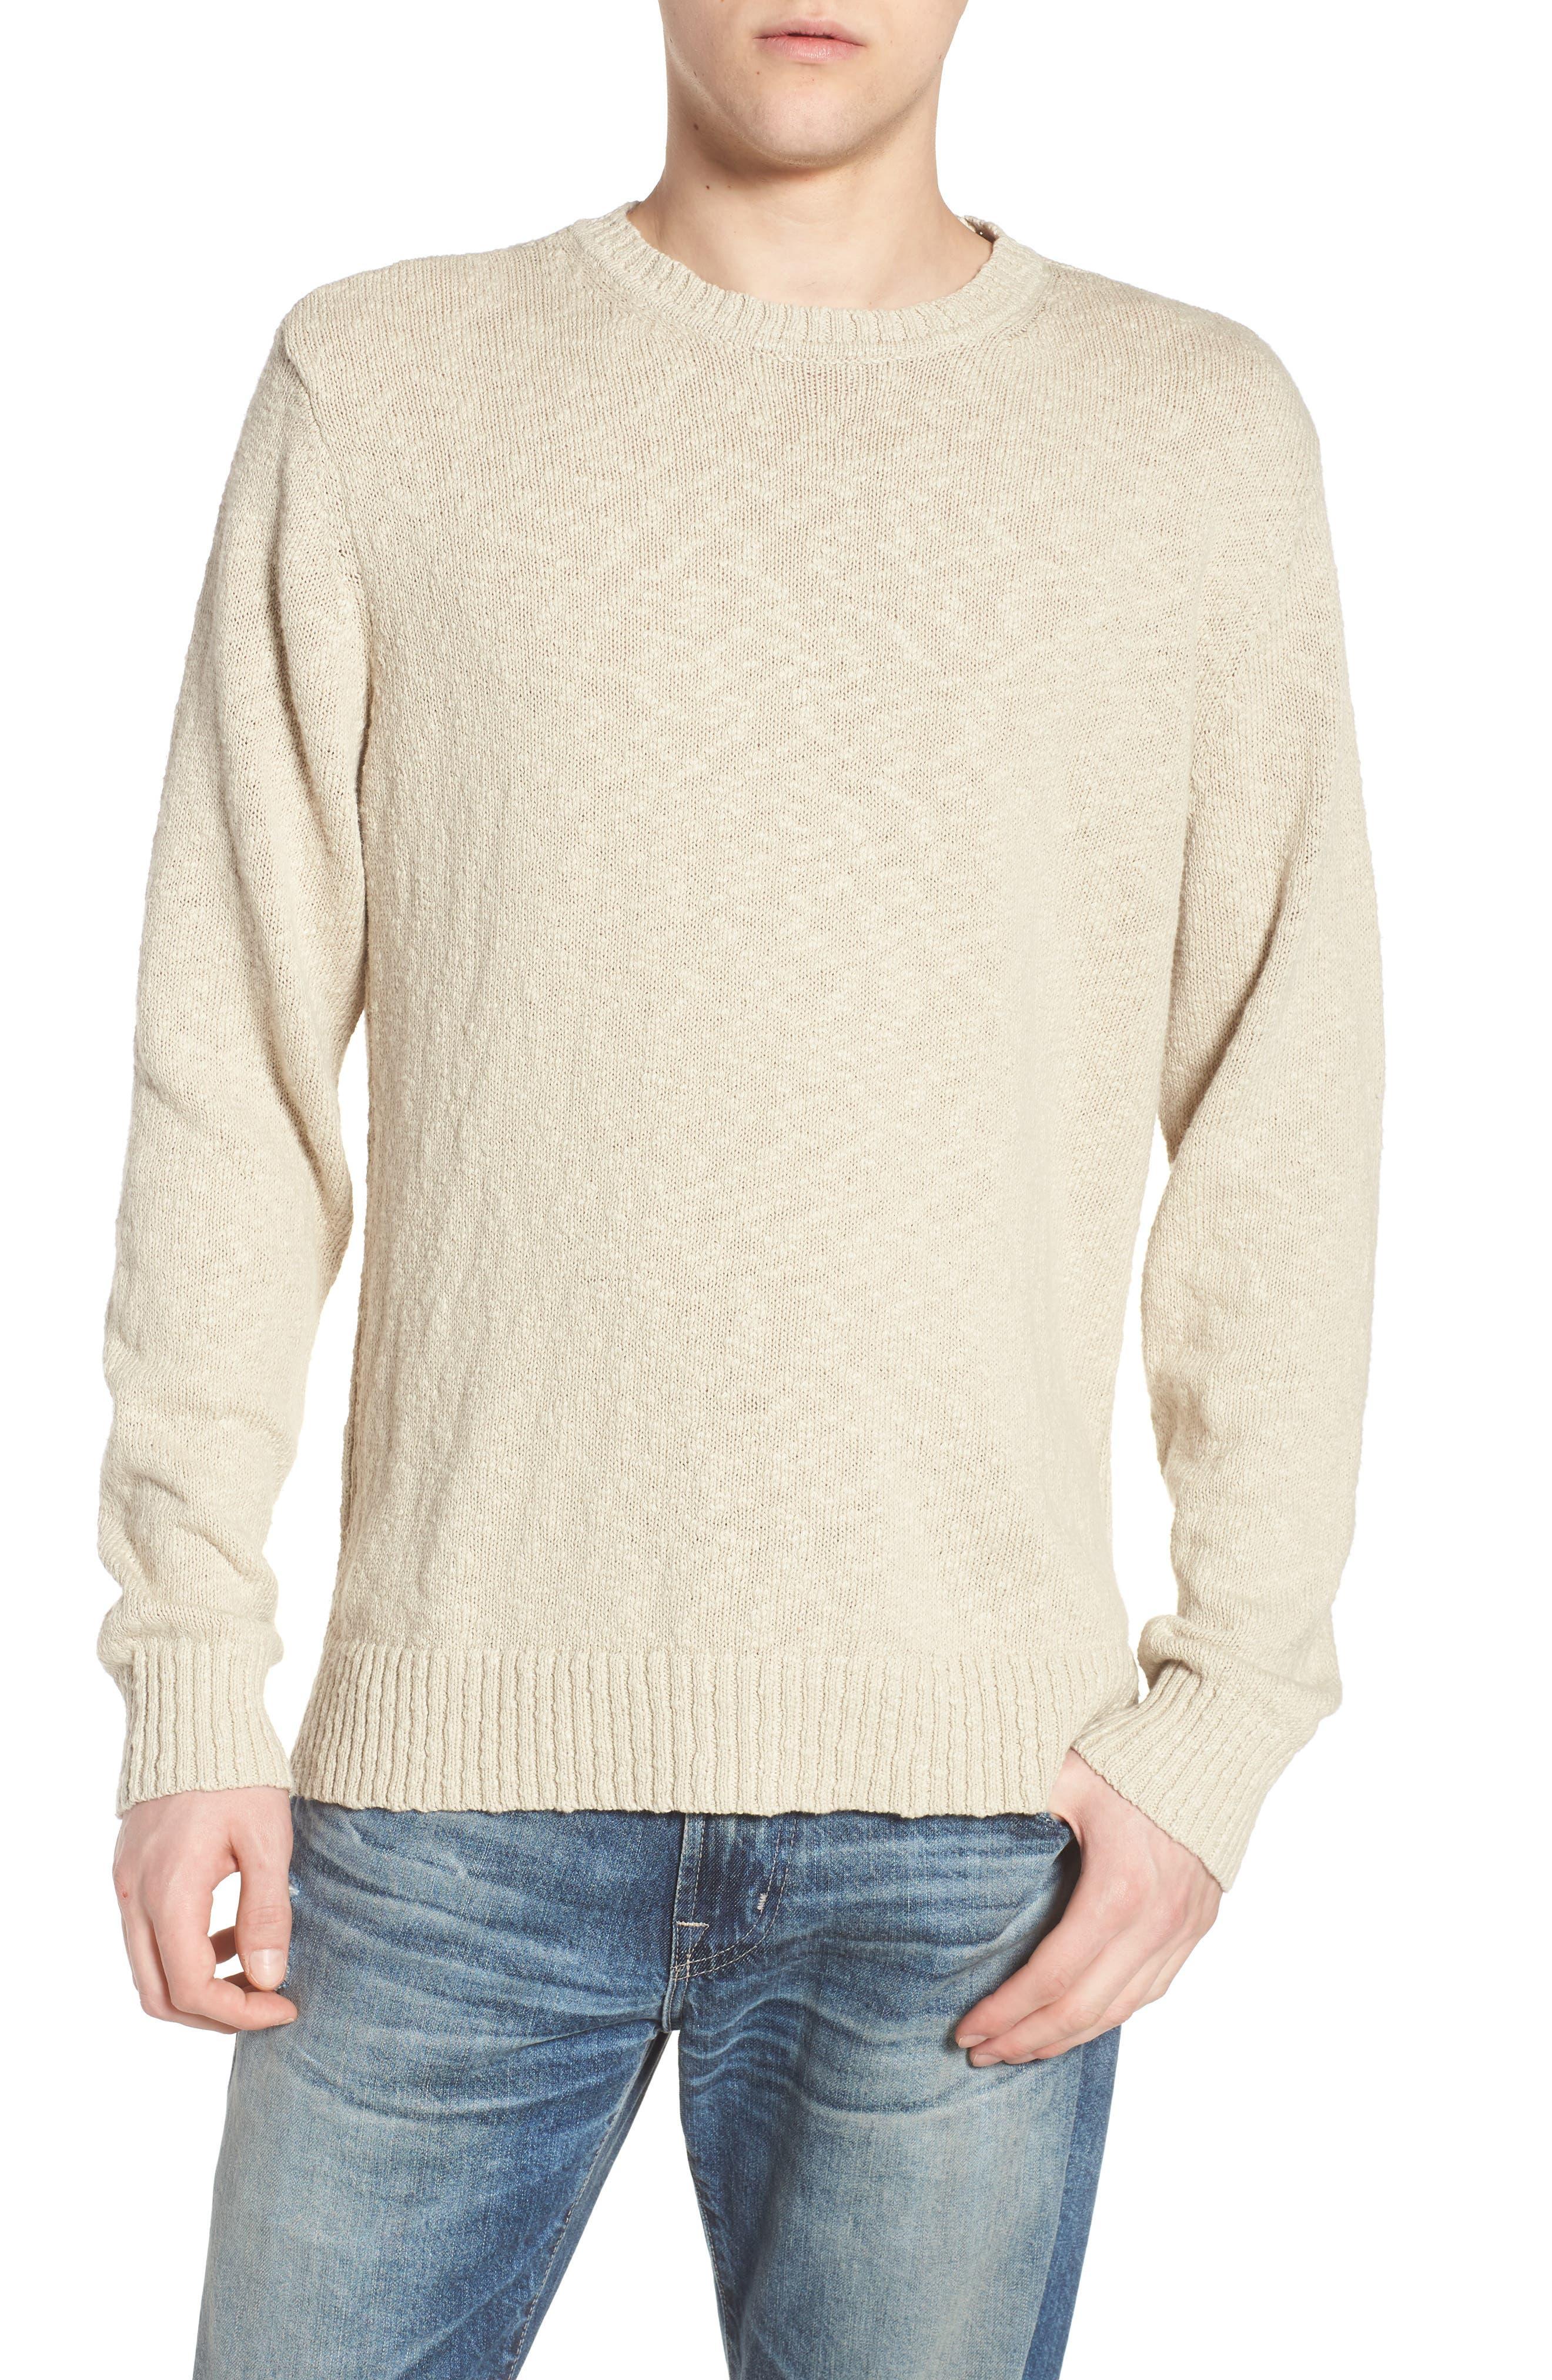 Deklyn Slim Fit Crew Sweater,                             Main thumbnail 1, color,                             Mineral Veil